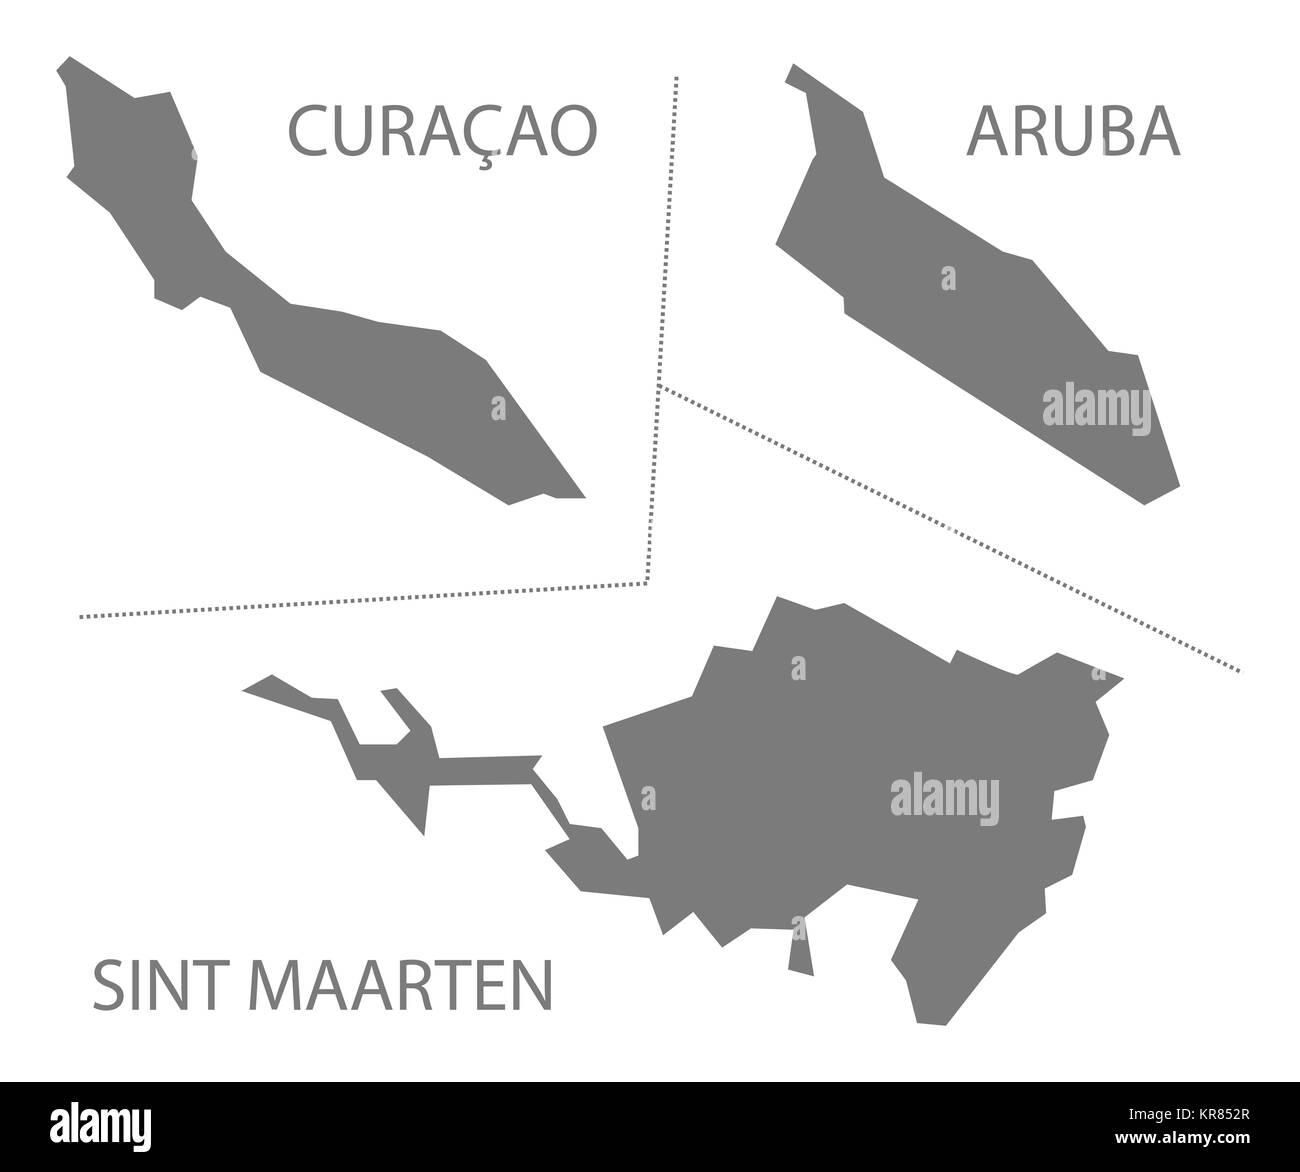 Curacao Aruba Sint Maarten Islands Netherlands Map grey Stock